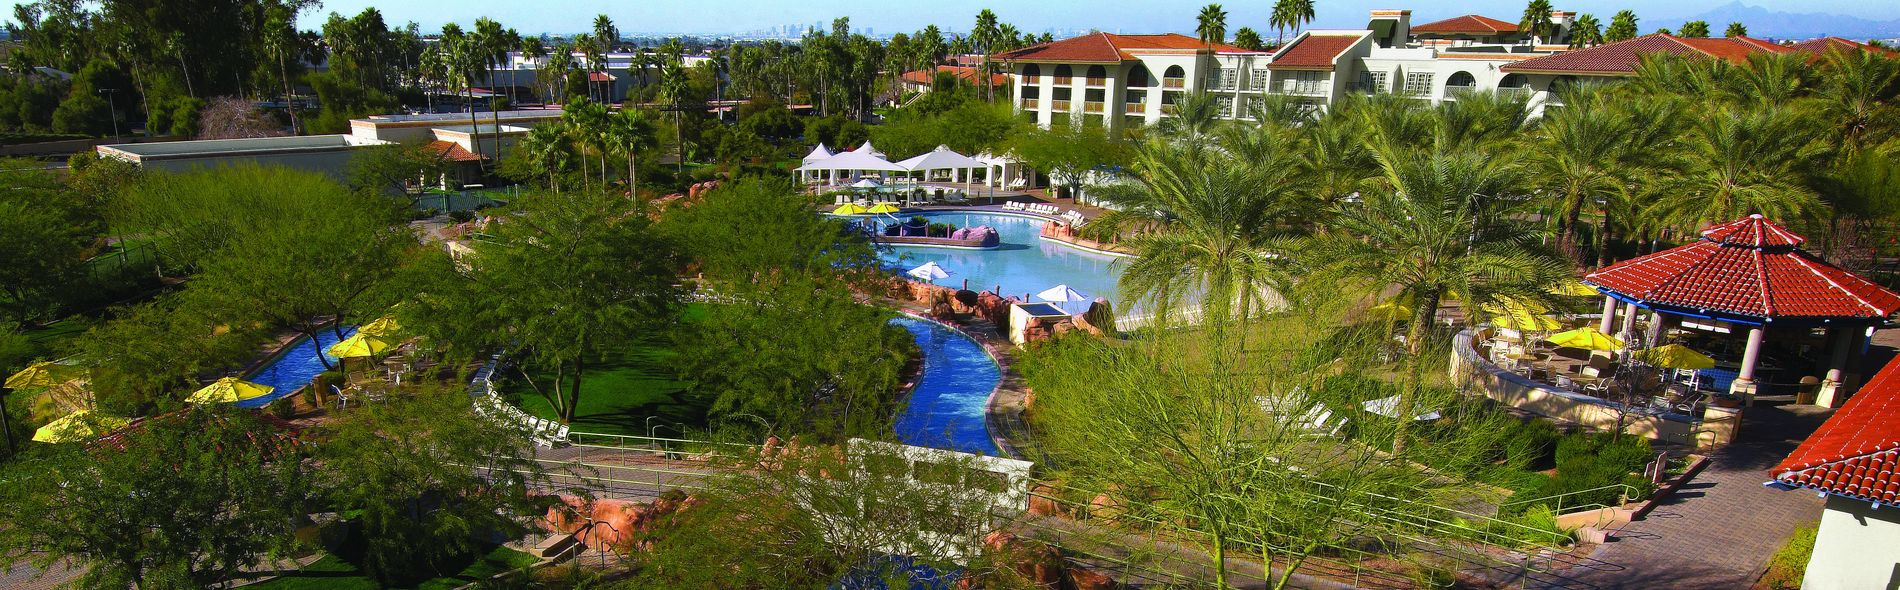 Best Kitchen Gallery: Hotels Near Arizona State University Arizona Grand Resort Spa of Phoenix Resort Hotels  on rachelxblog.com